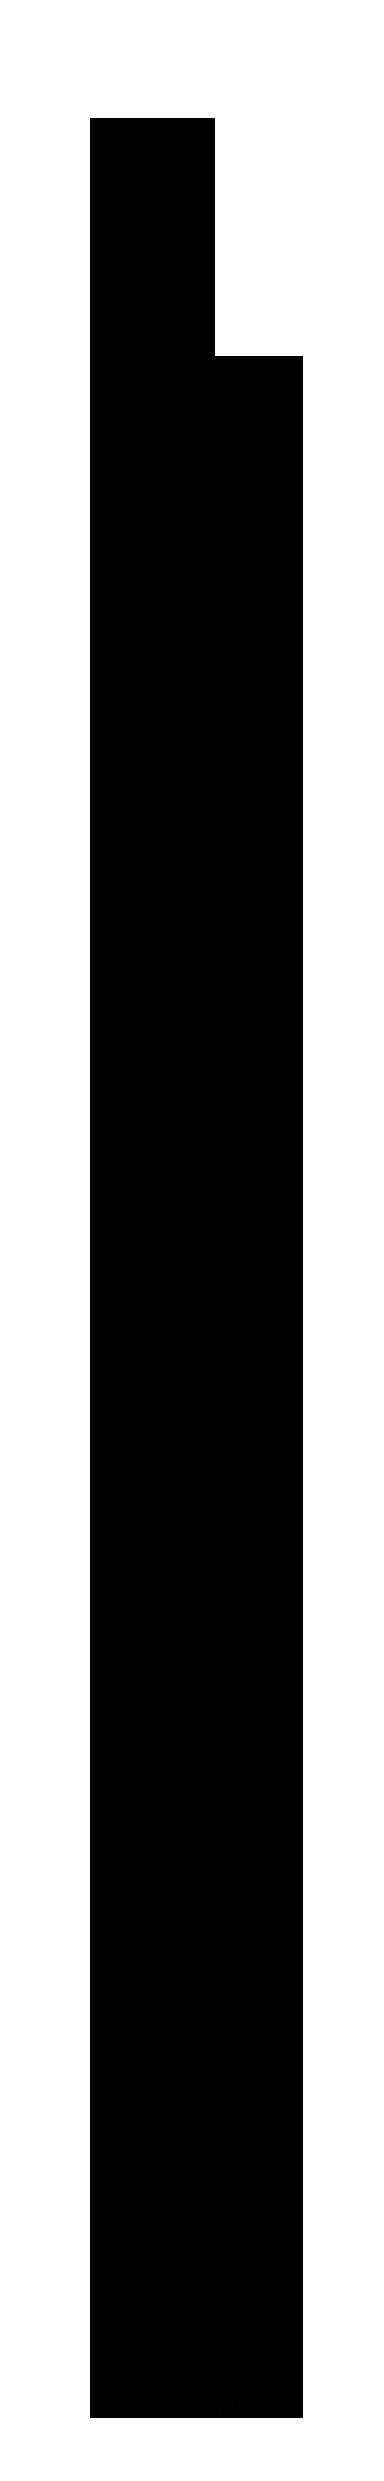 Luton MDF Primed Skirting Board 18mm Profile